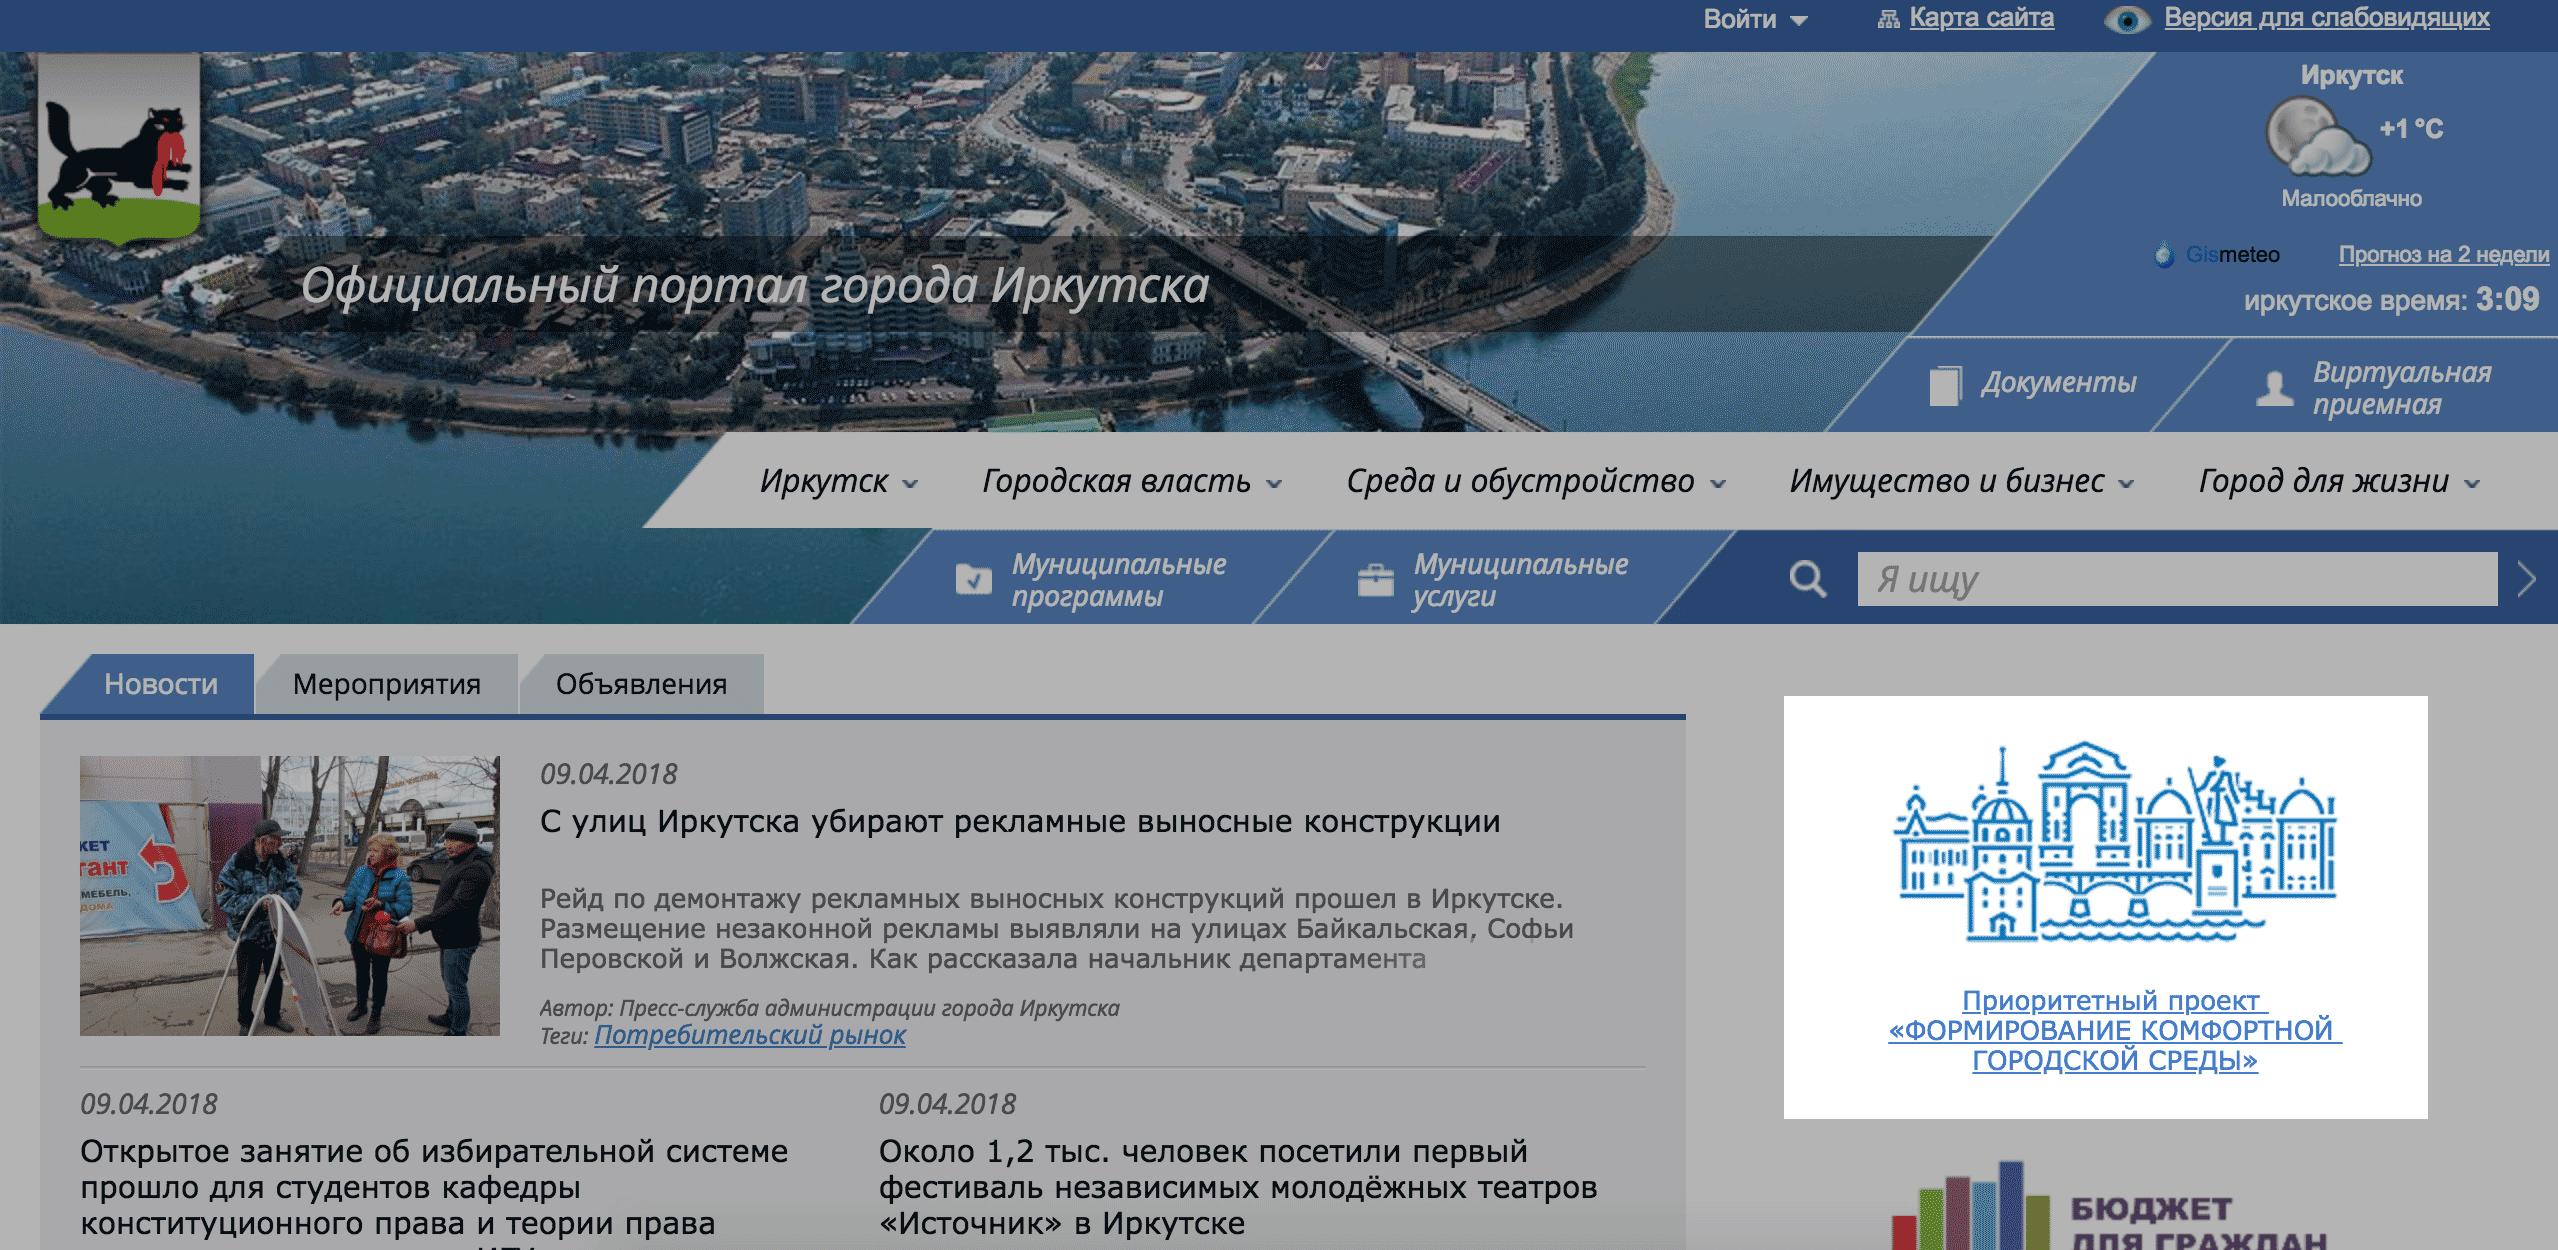 Ссылка на программу на сайте администрации Иркутска